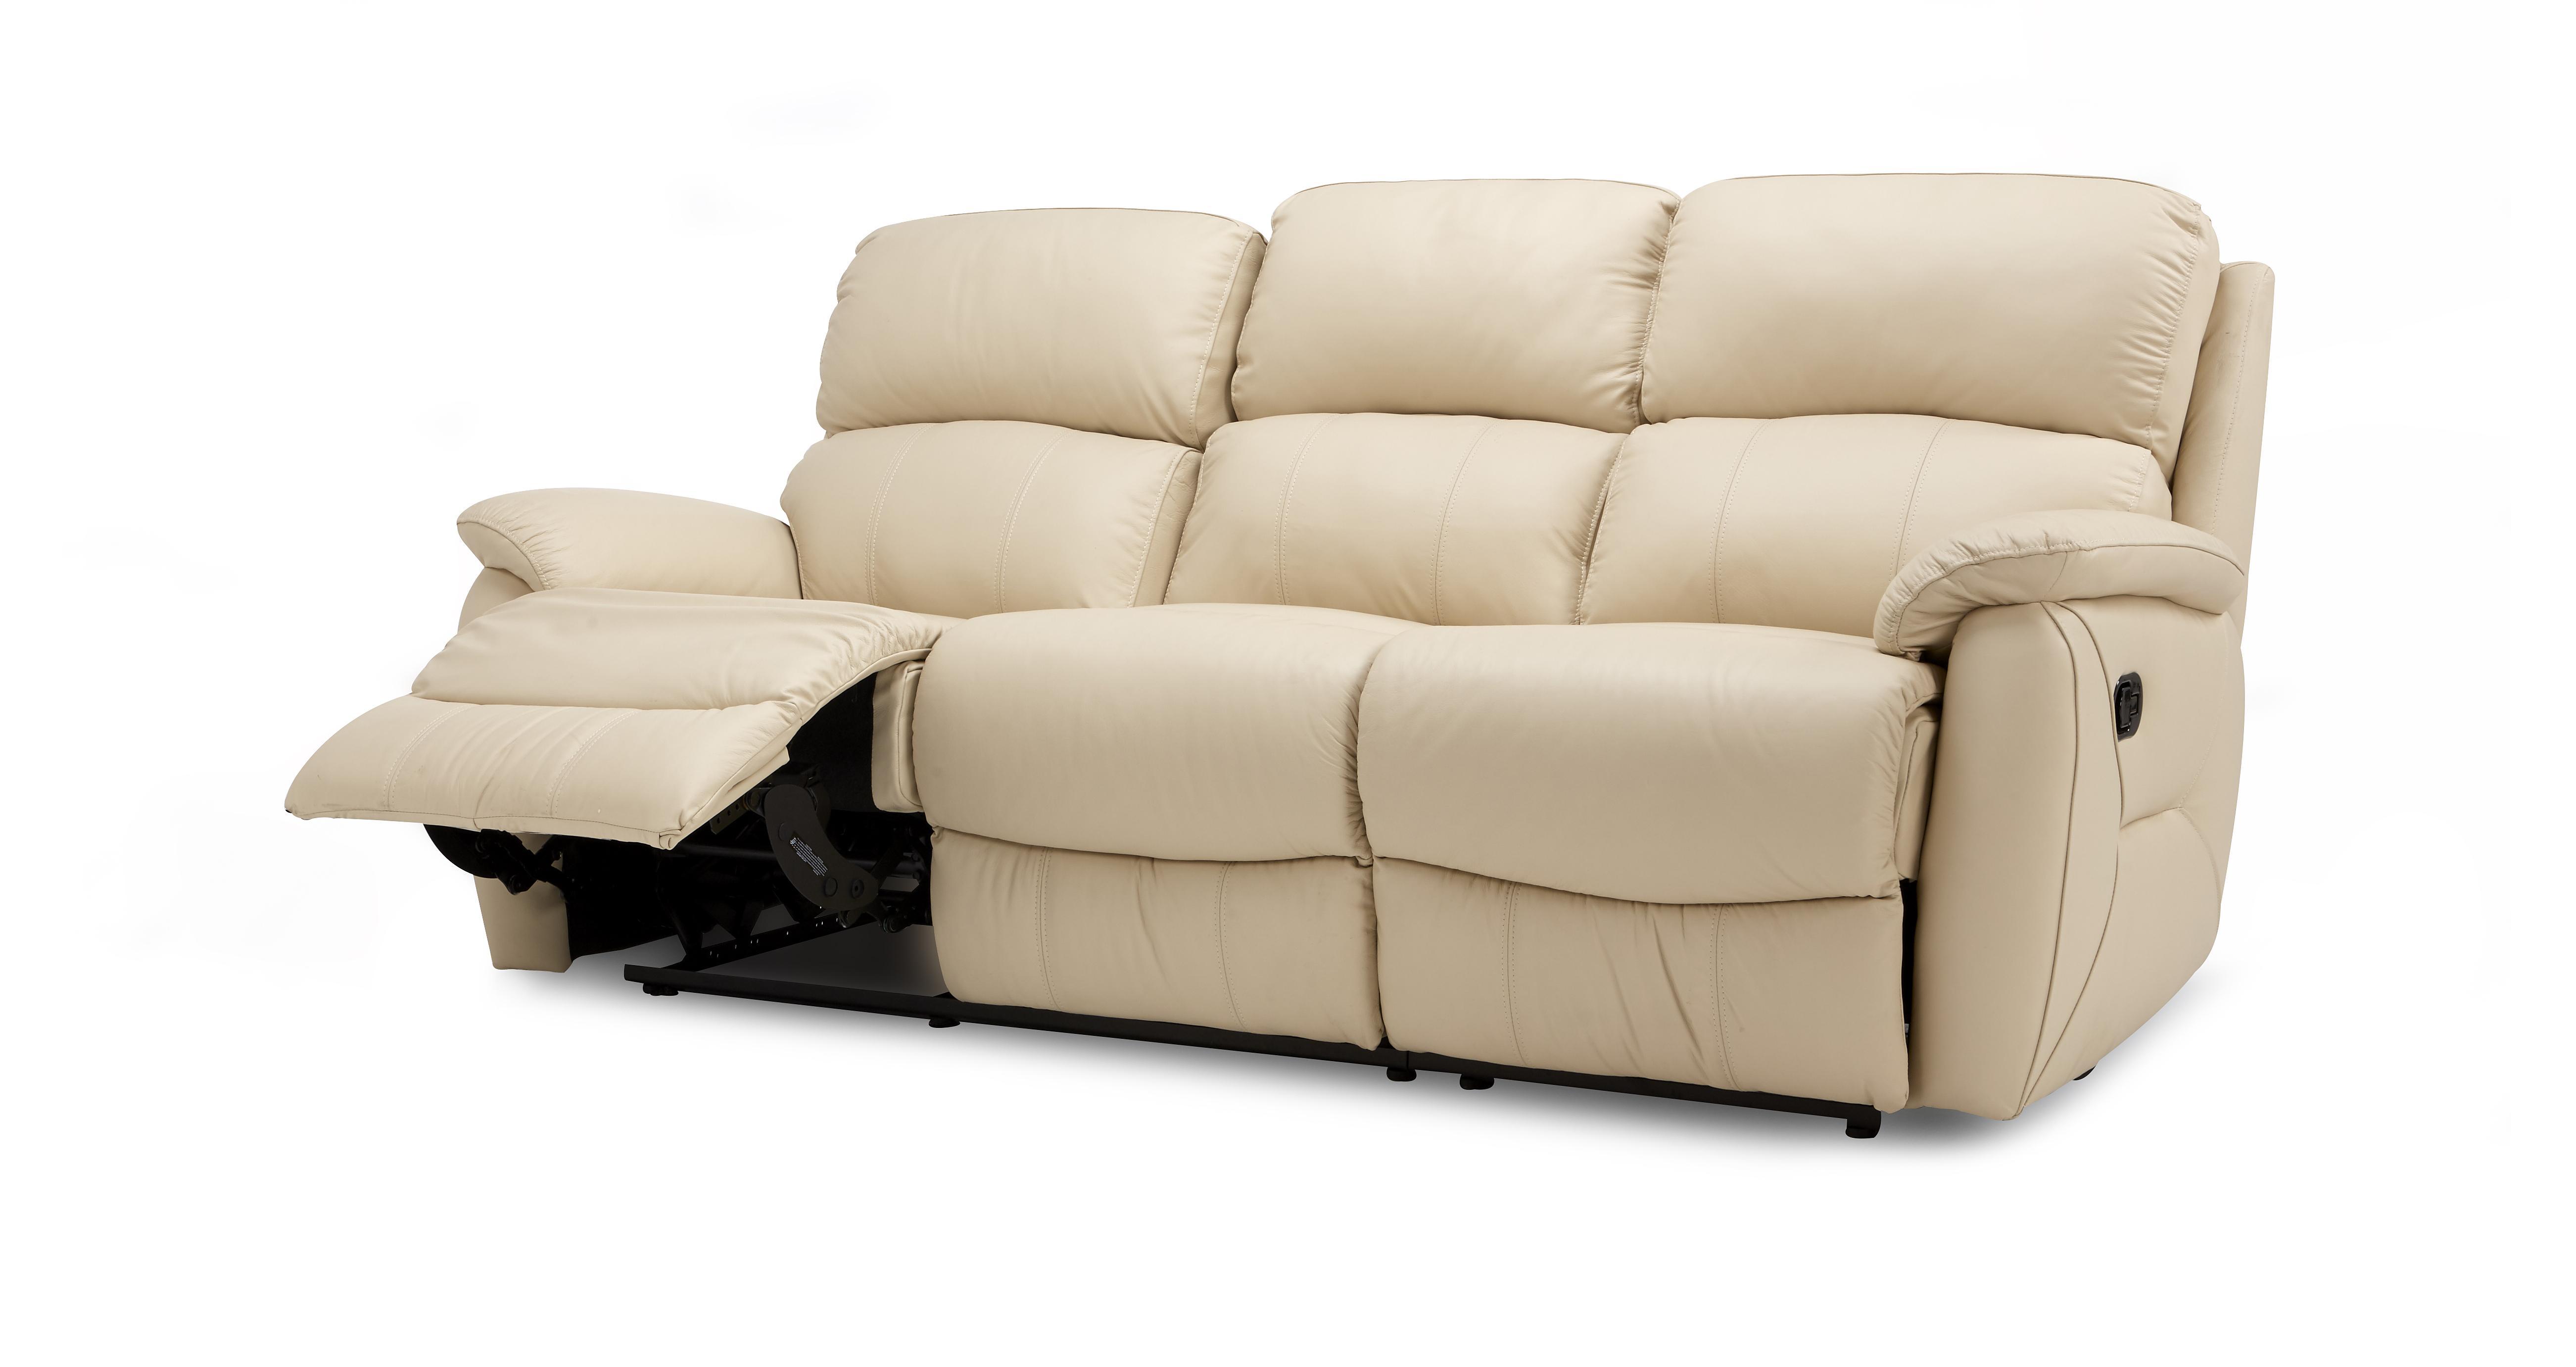 Astounding Navona 3 Seater Manual Recliner Inzonedesignstudio Interior Chair Design Inzonedesignstudiocom